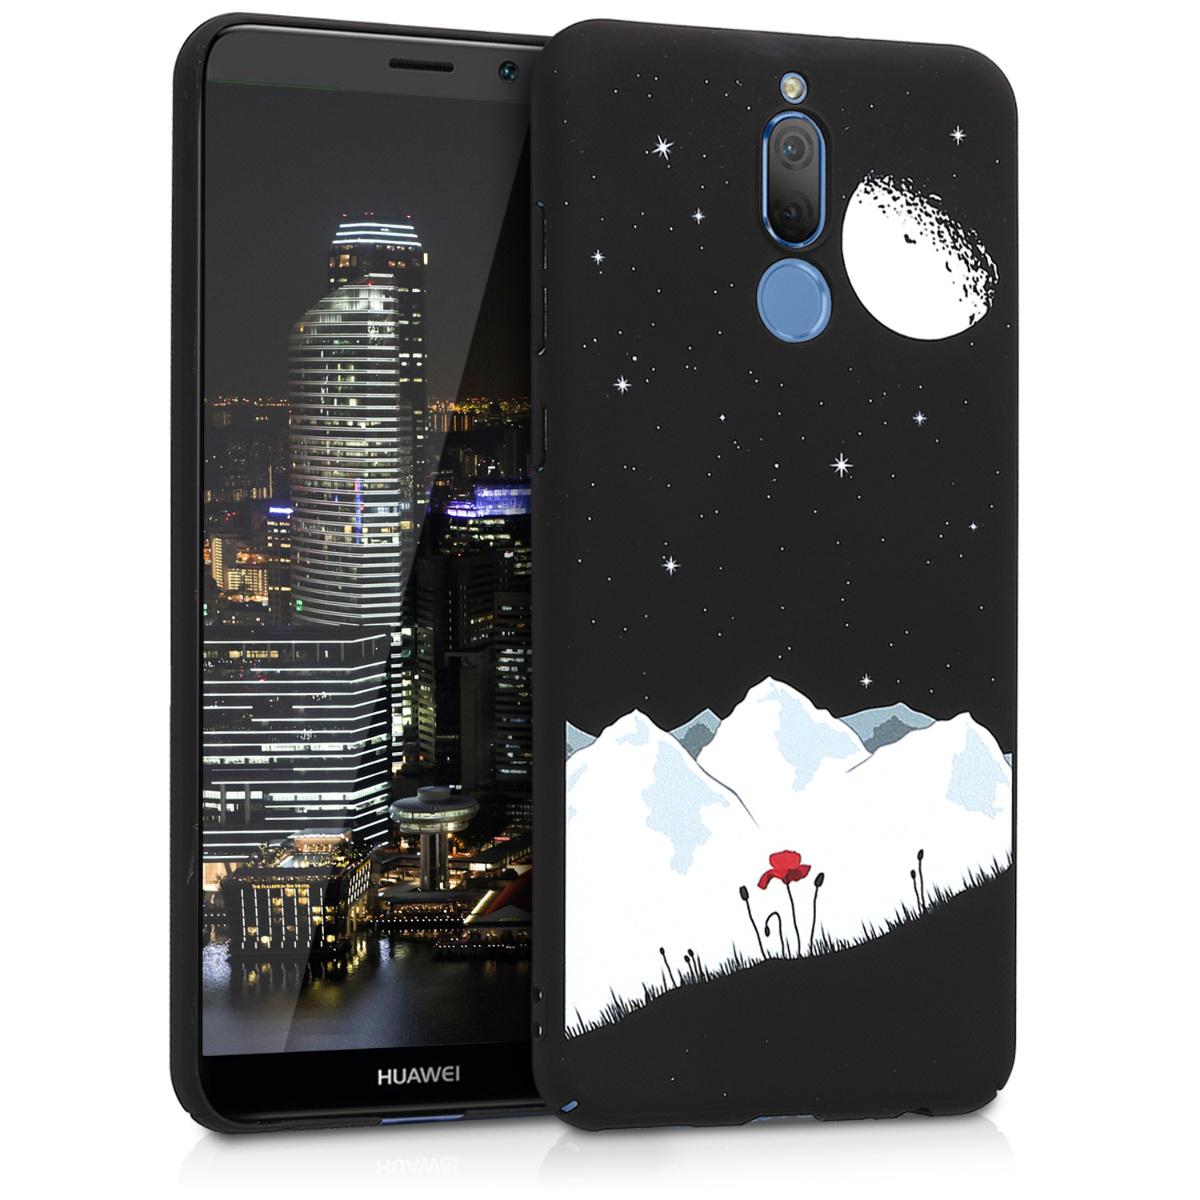 KW Slim Anti-Slip Cover - Σκληρή Θήκη Καουτσούκ Huawei Mate 10 Lite - Μαύρο/Άσπρο (44112.03)